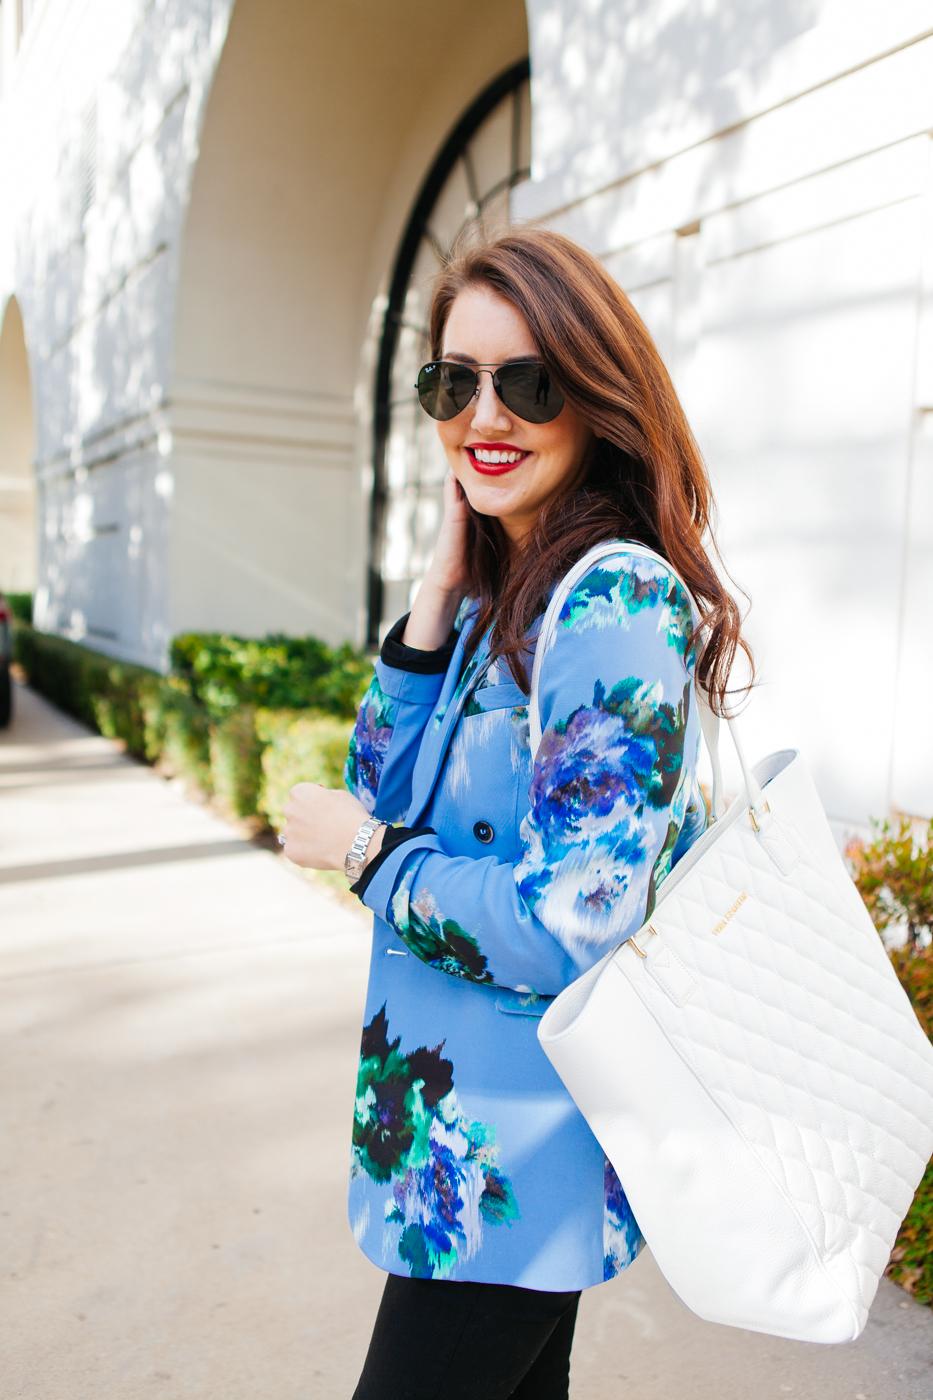 DFW Beauty Guide - Amy Havins - Dallas Wardrobe